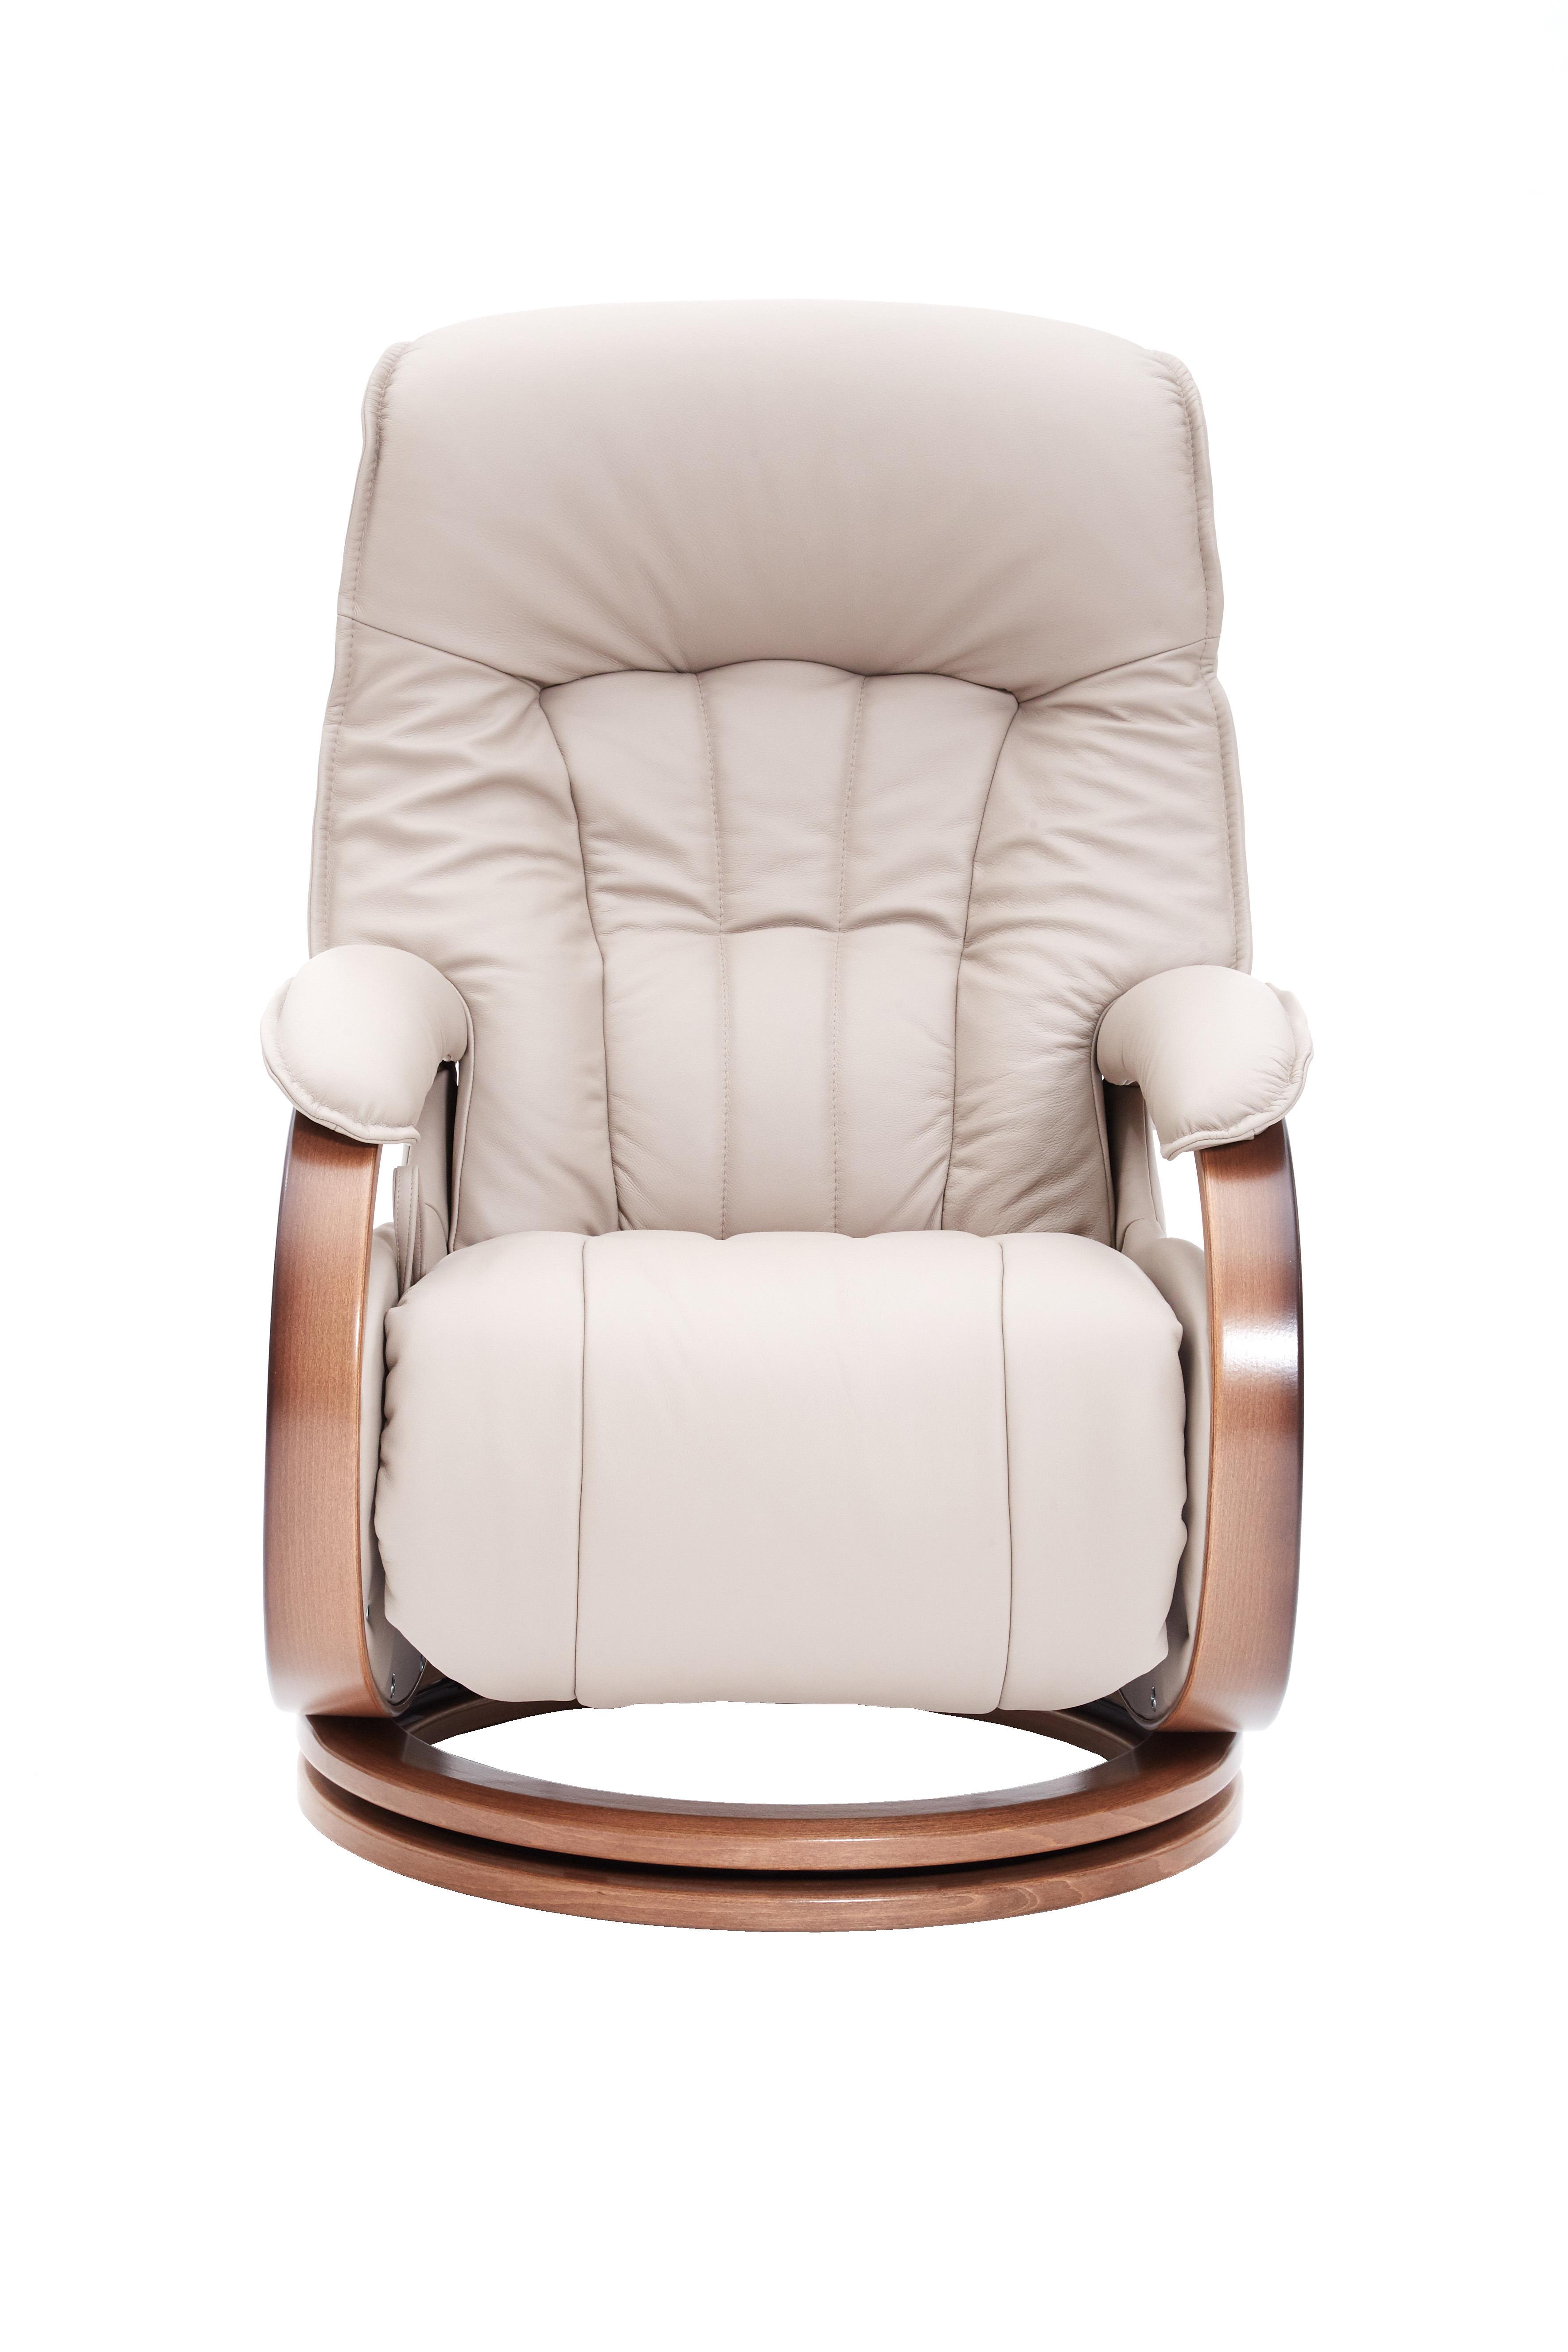 Himolla Mosel Swivel Chair